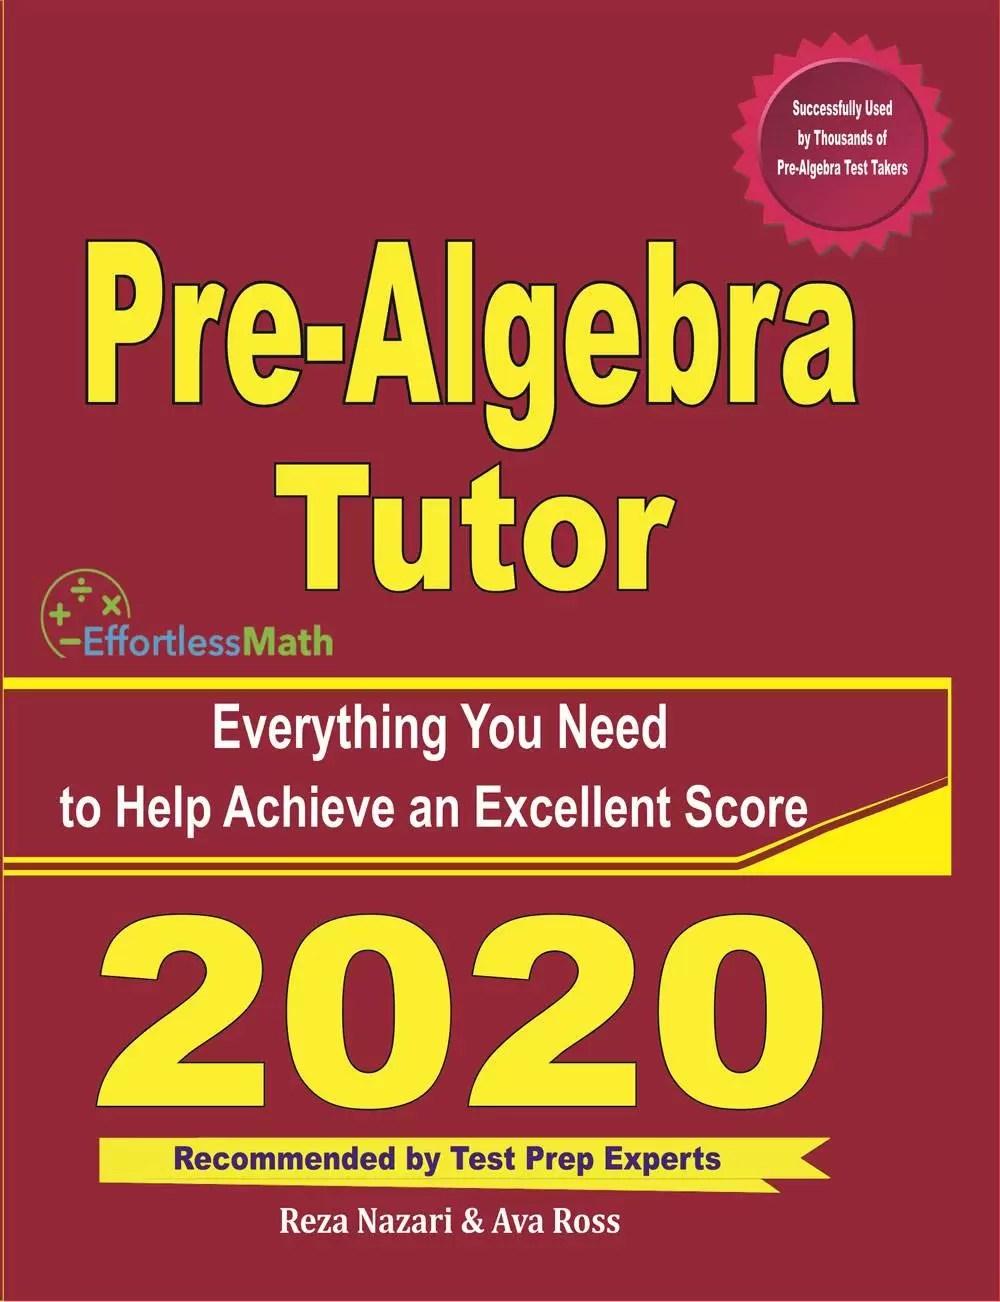 hight resolution of Pre-Algebra Worksheets - Effortless Math